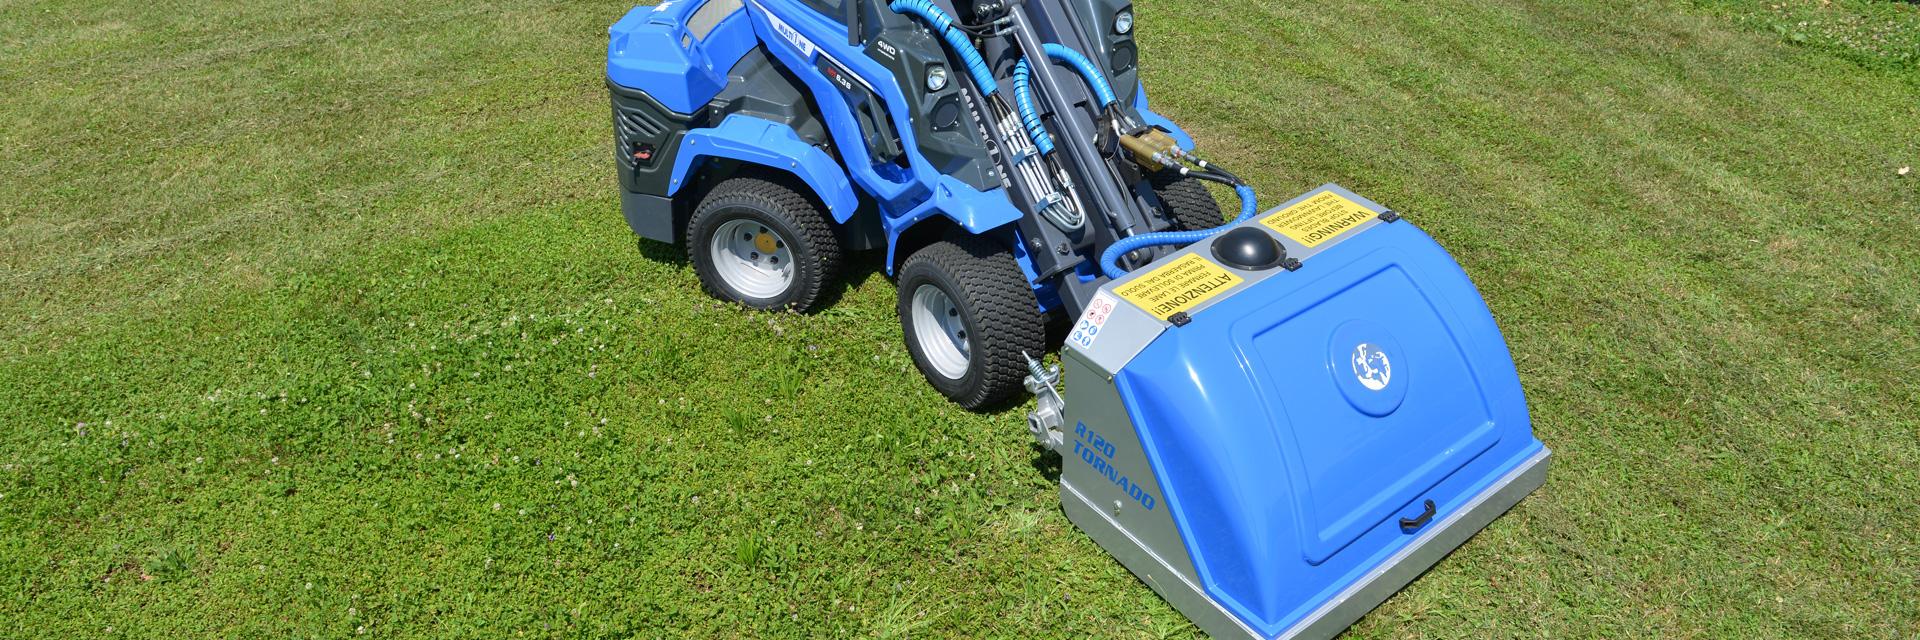 tornado lawn mower for mini loader